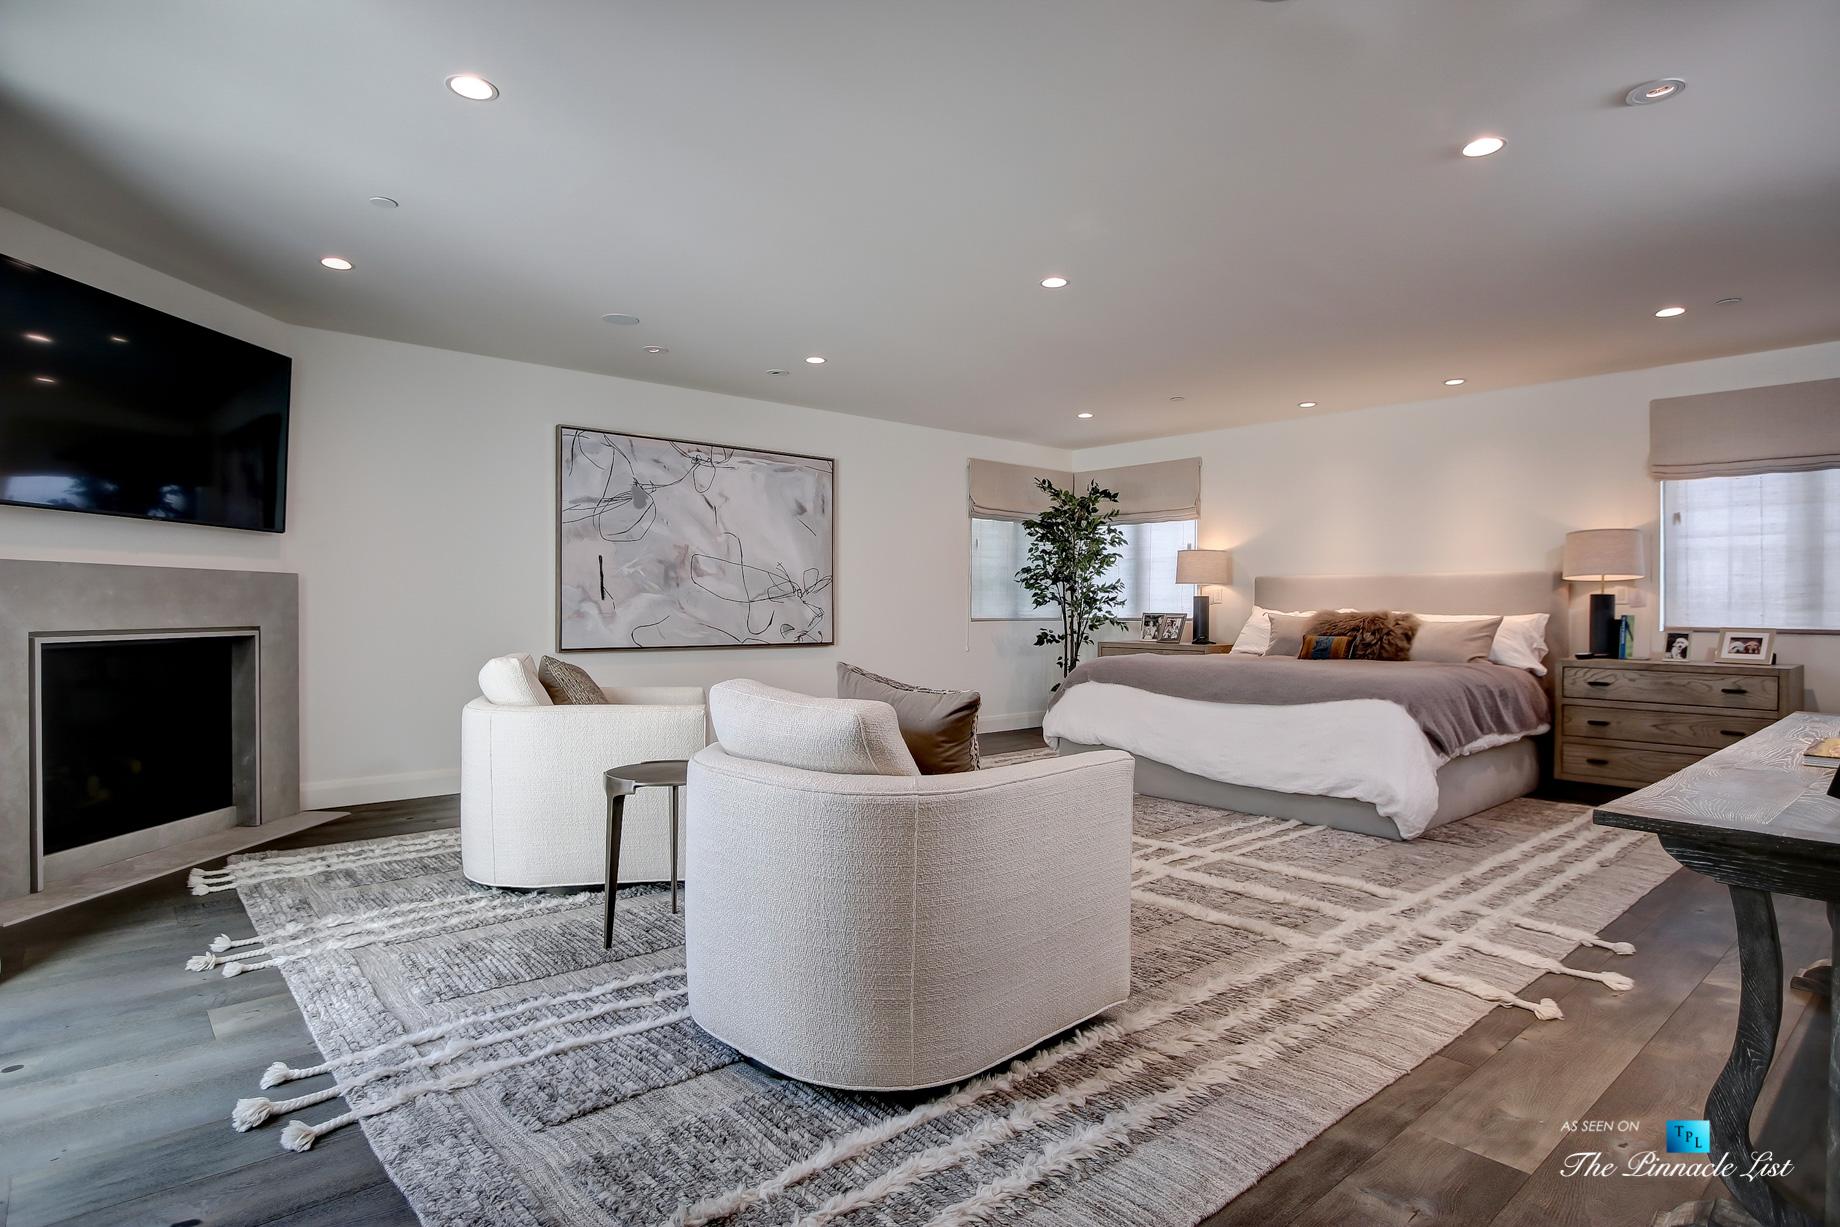 825 Highview Ave, Manhattan Beach, CA, USA - Master Bedroom Suite - Luxury Real Estate - Modern Spanish Home